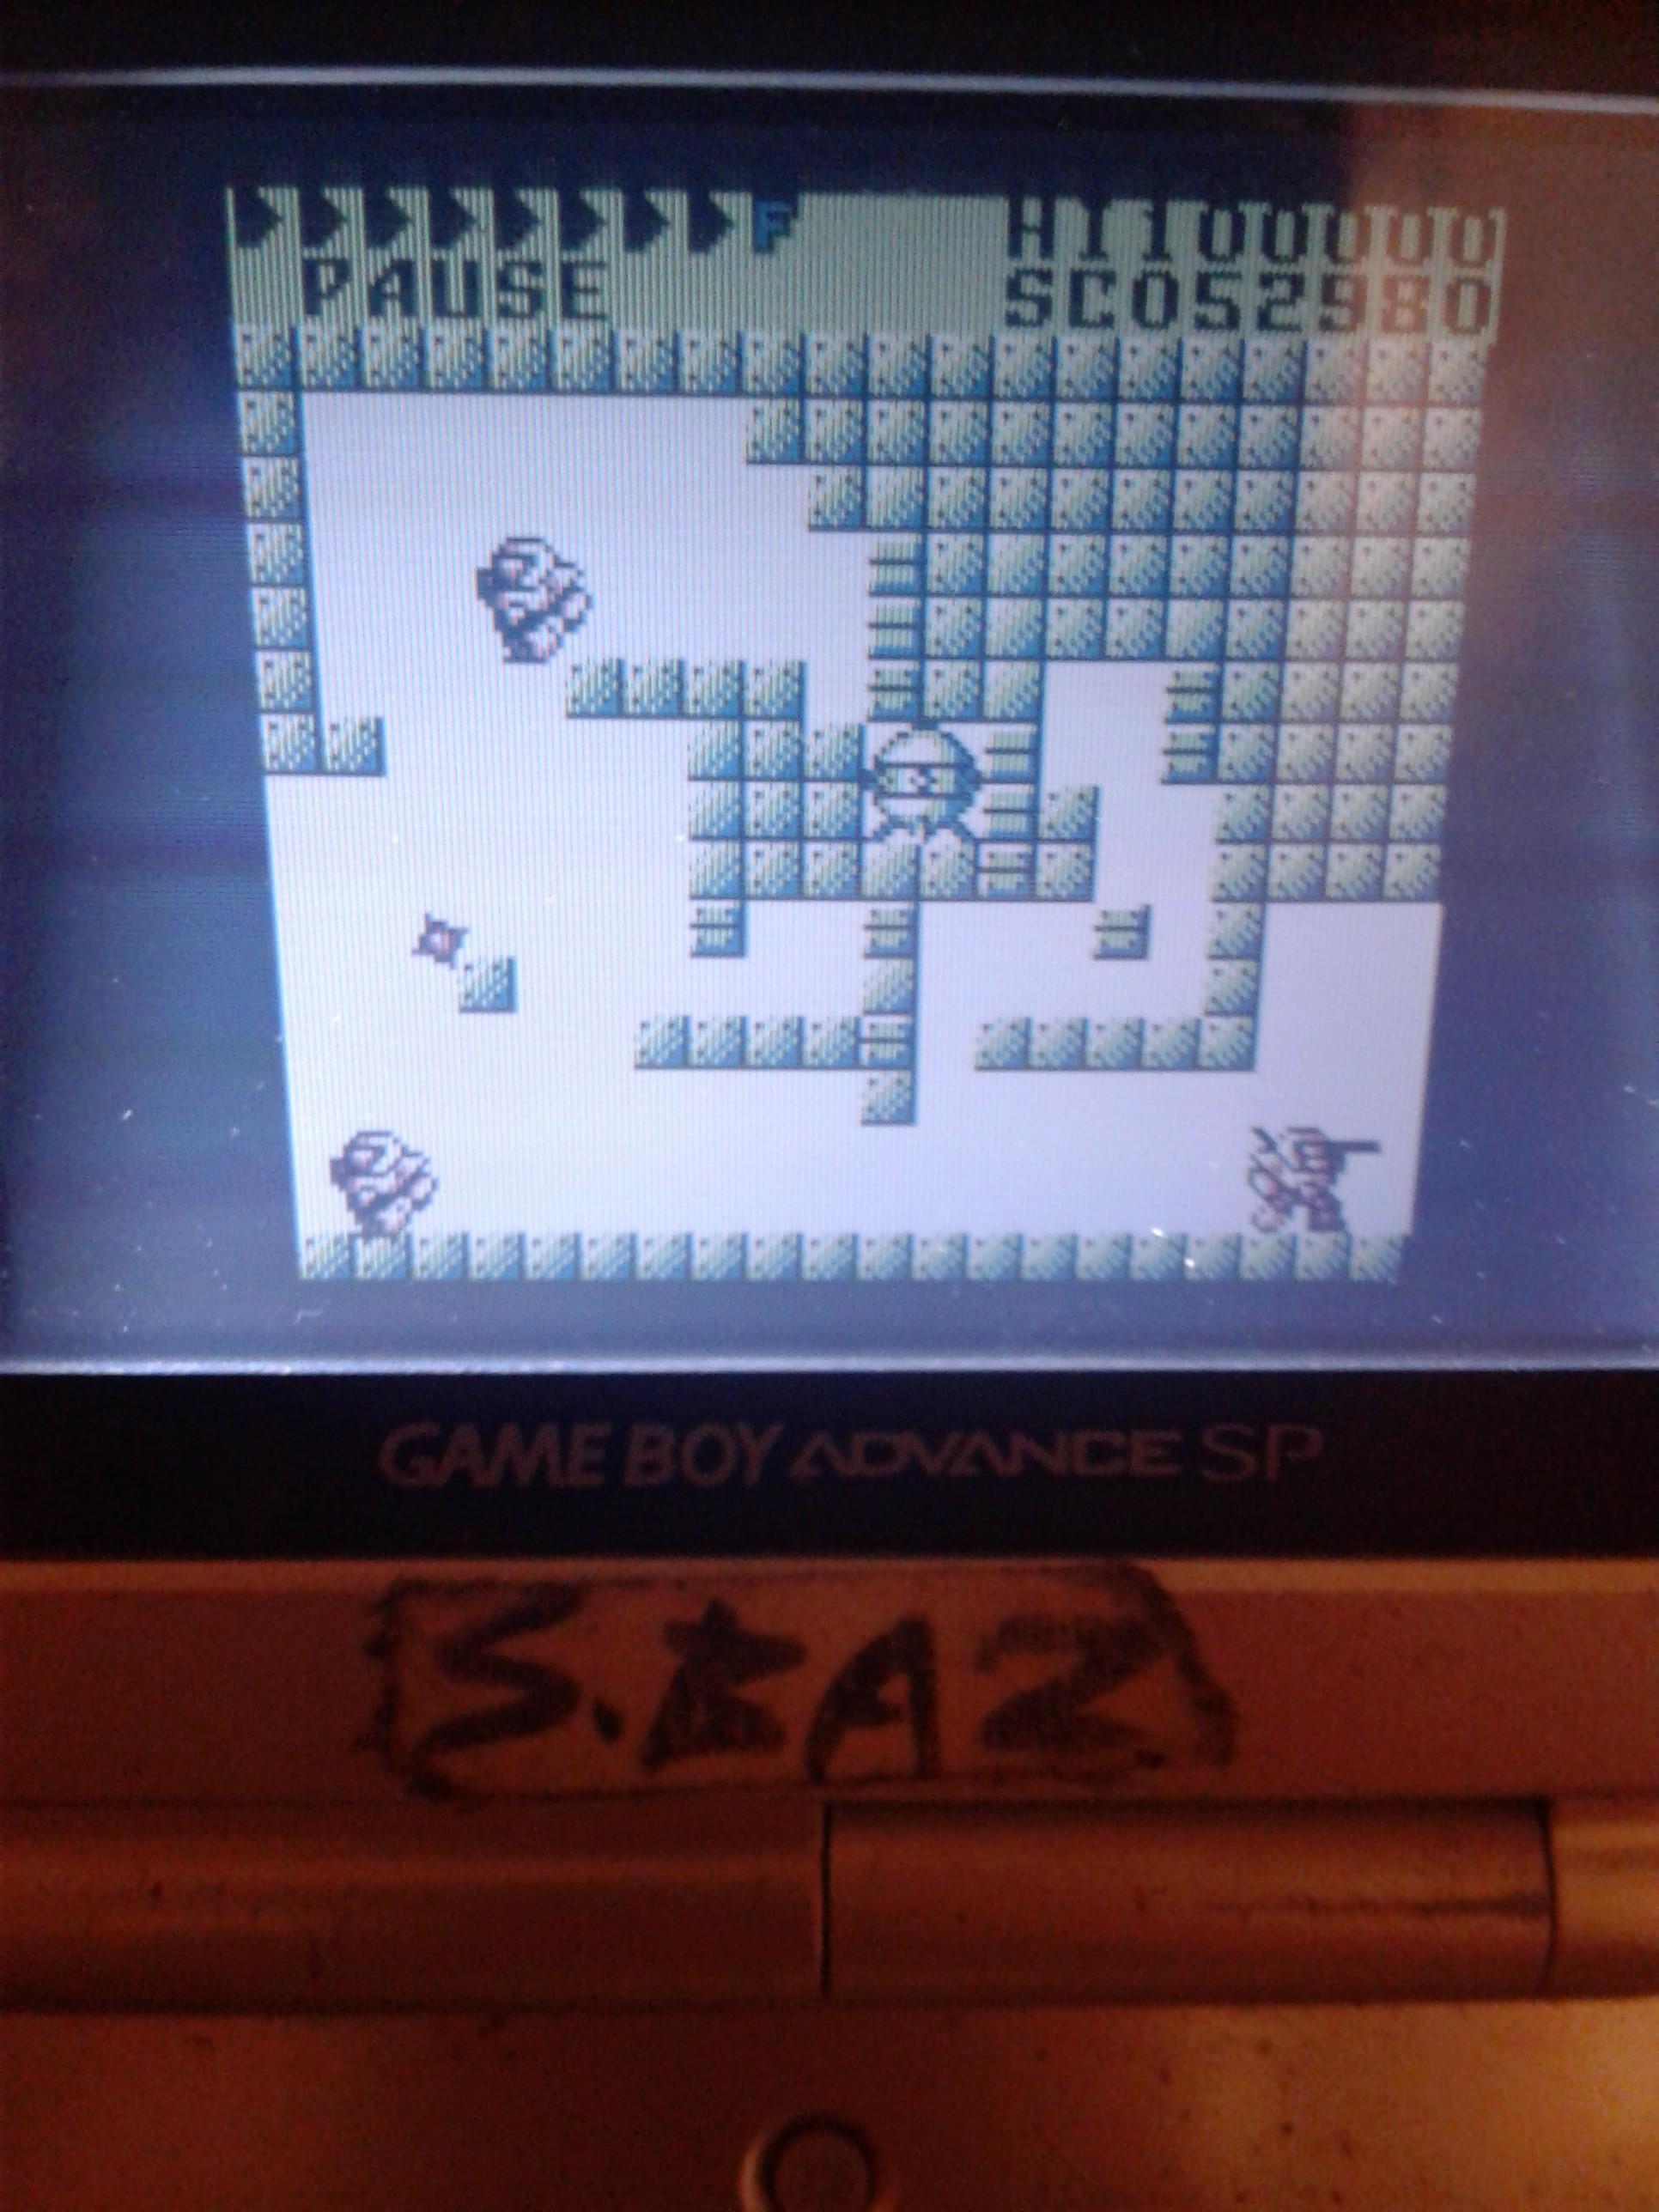 S.BAZ: After Burst [Normal] (Game Boy) 52,980 points on 2021-04-20 13:42:03